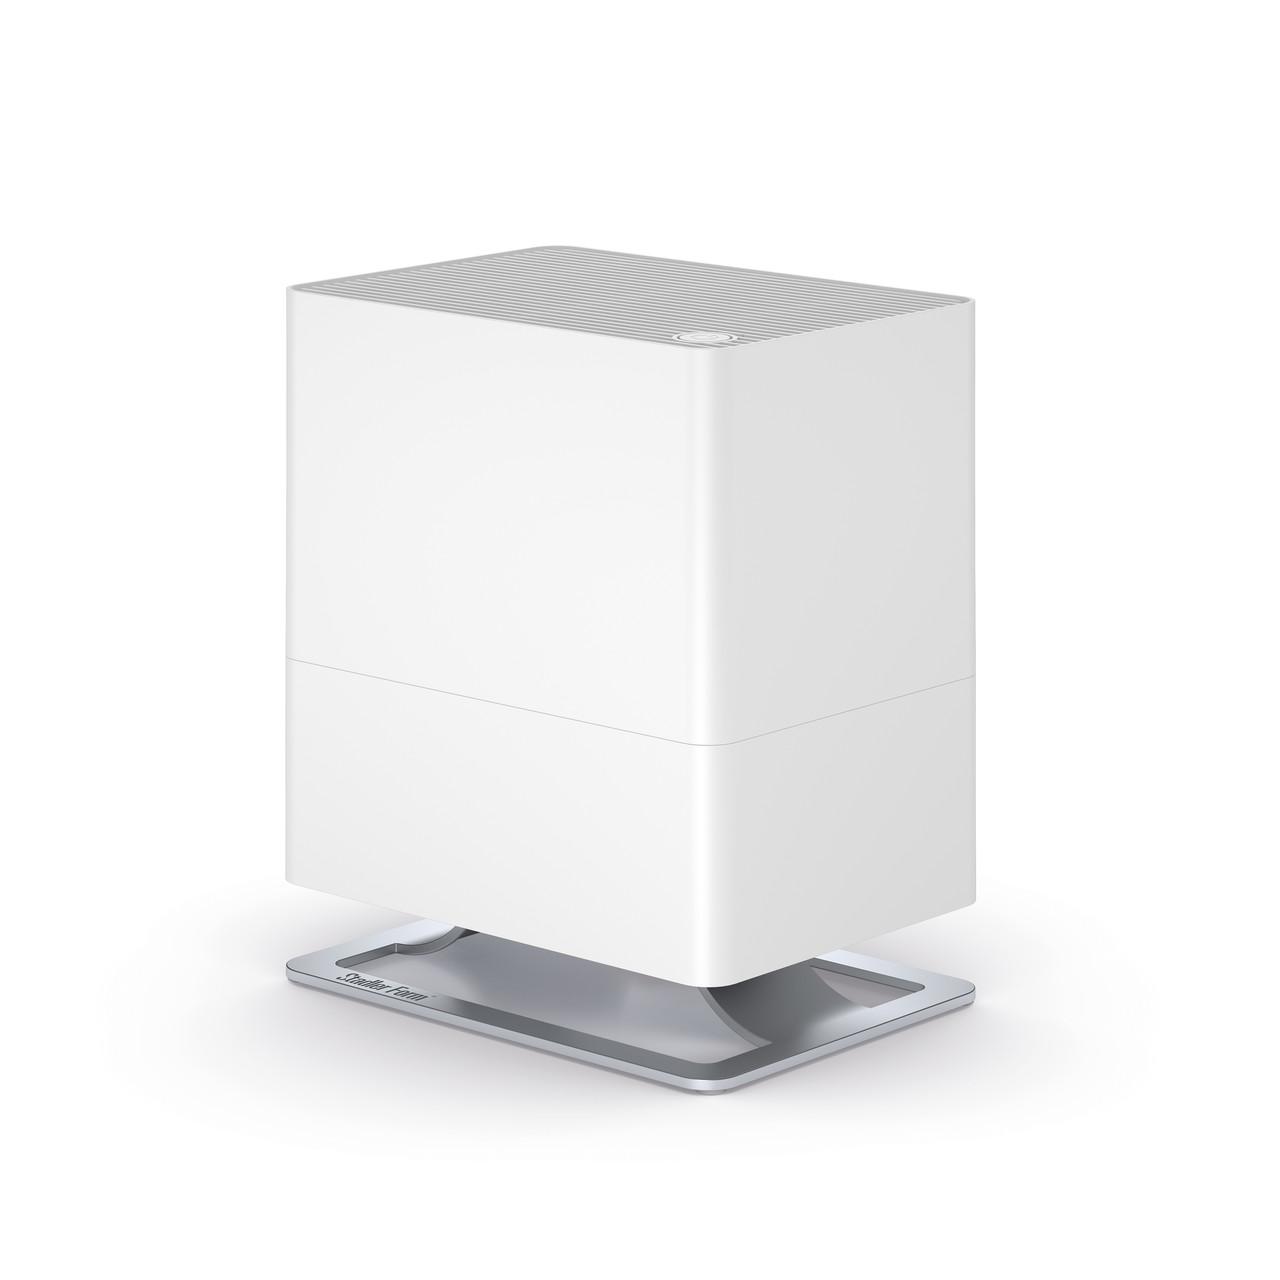 Увлажнитель воздуха традиционный Stadler Form Oskar Little White (O060)